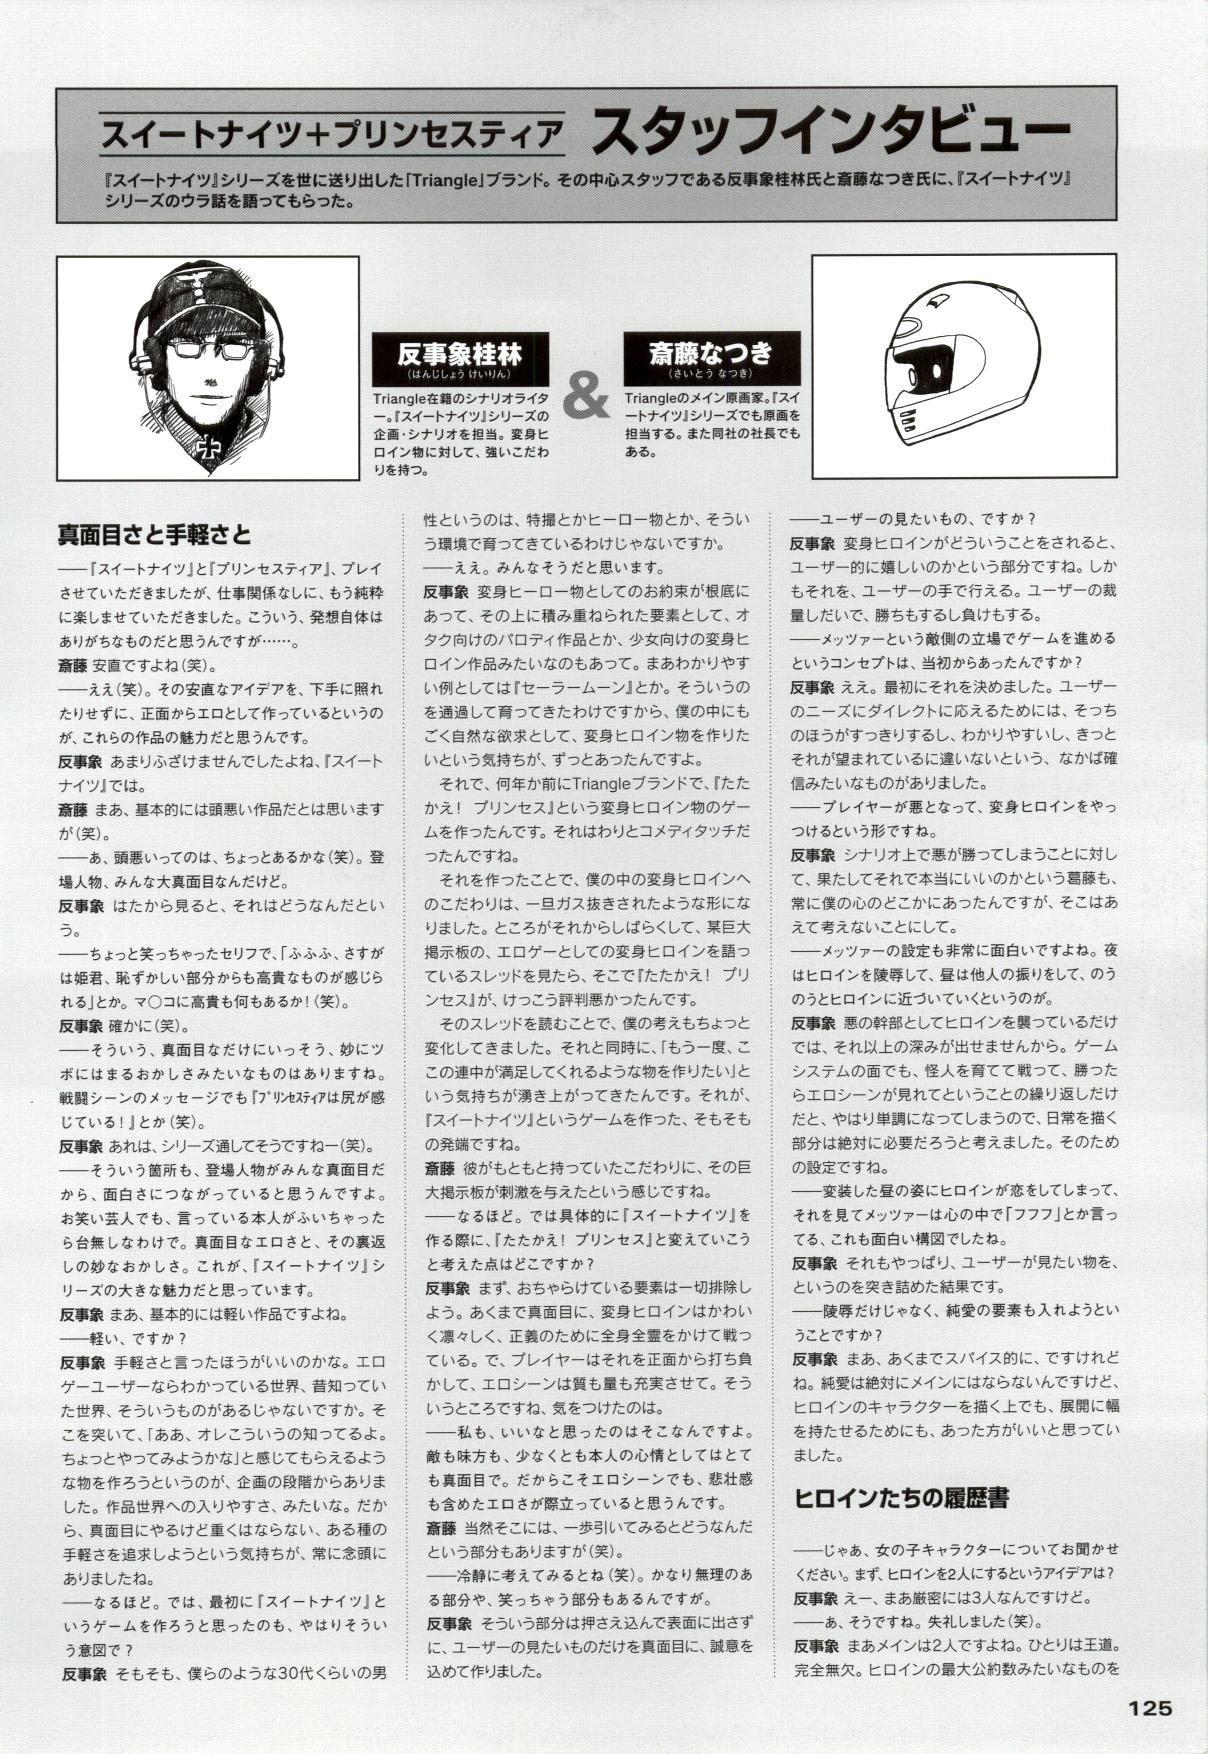 Mahou Senshi Sweet Knight & Mahou Senshi Princess Tear 124